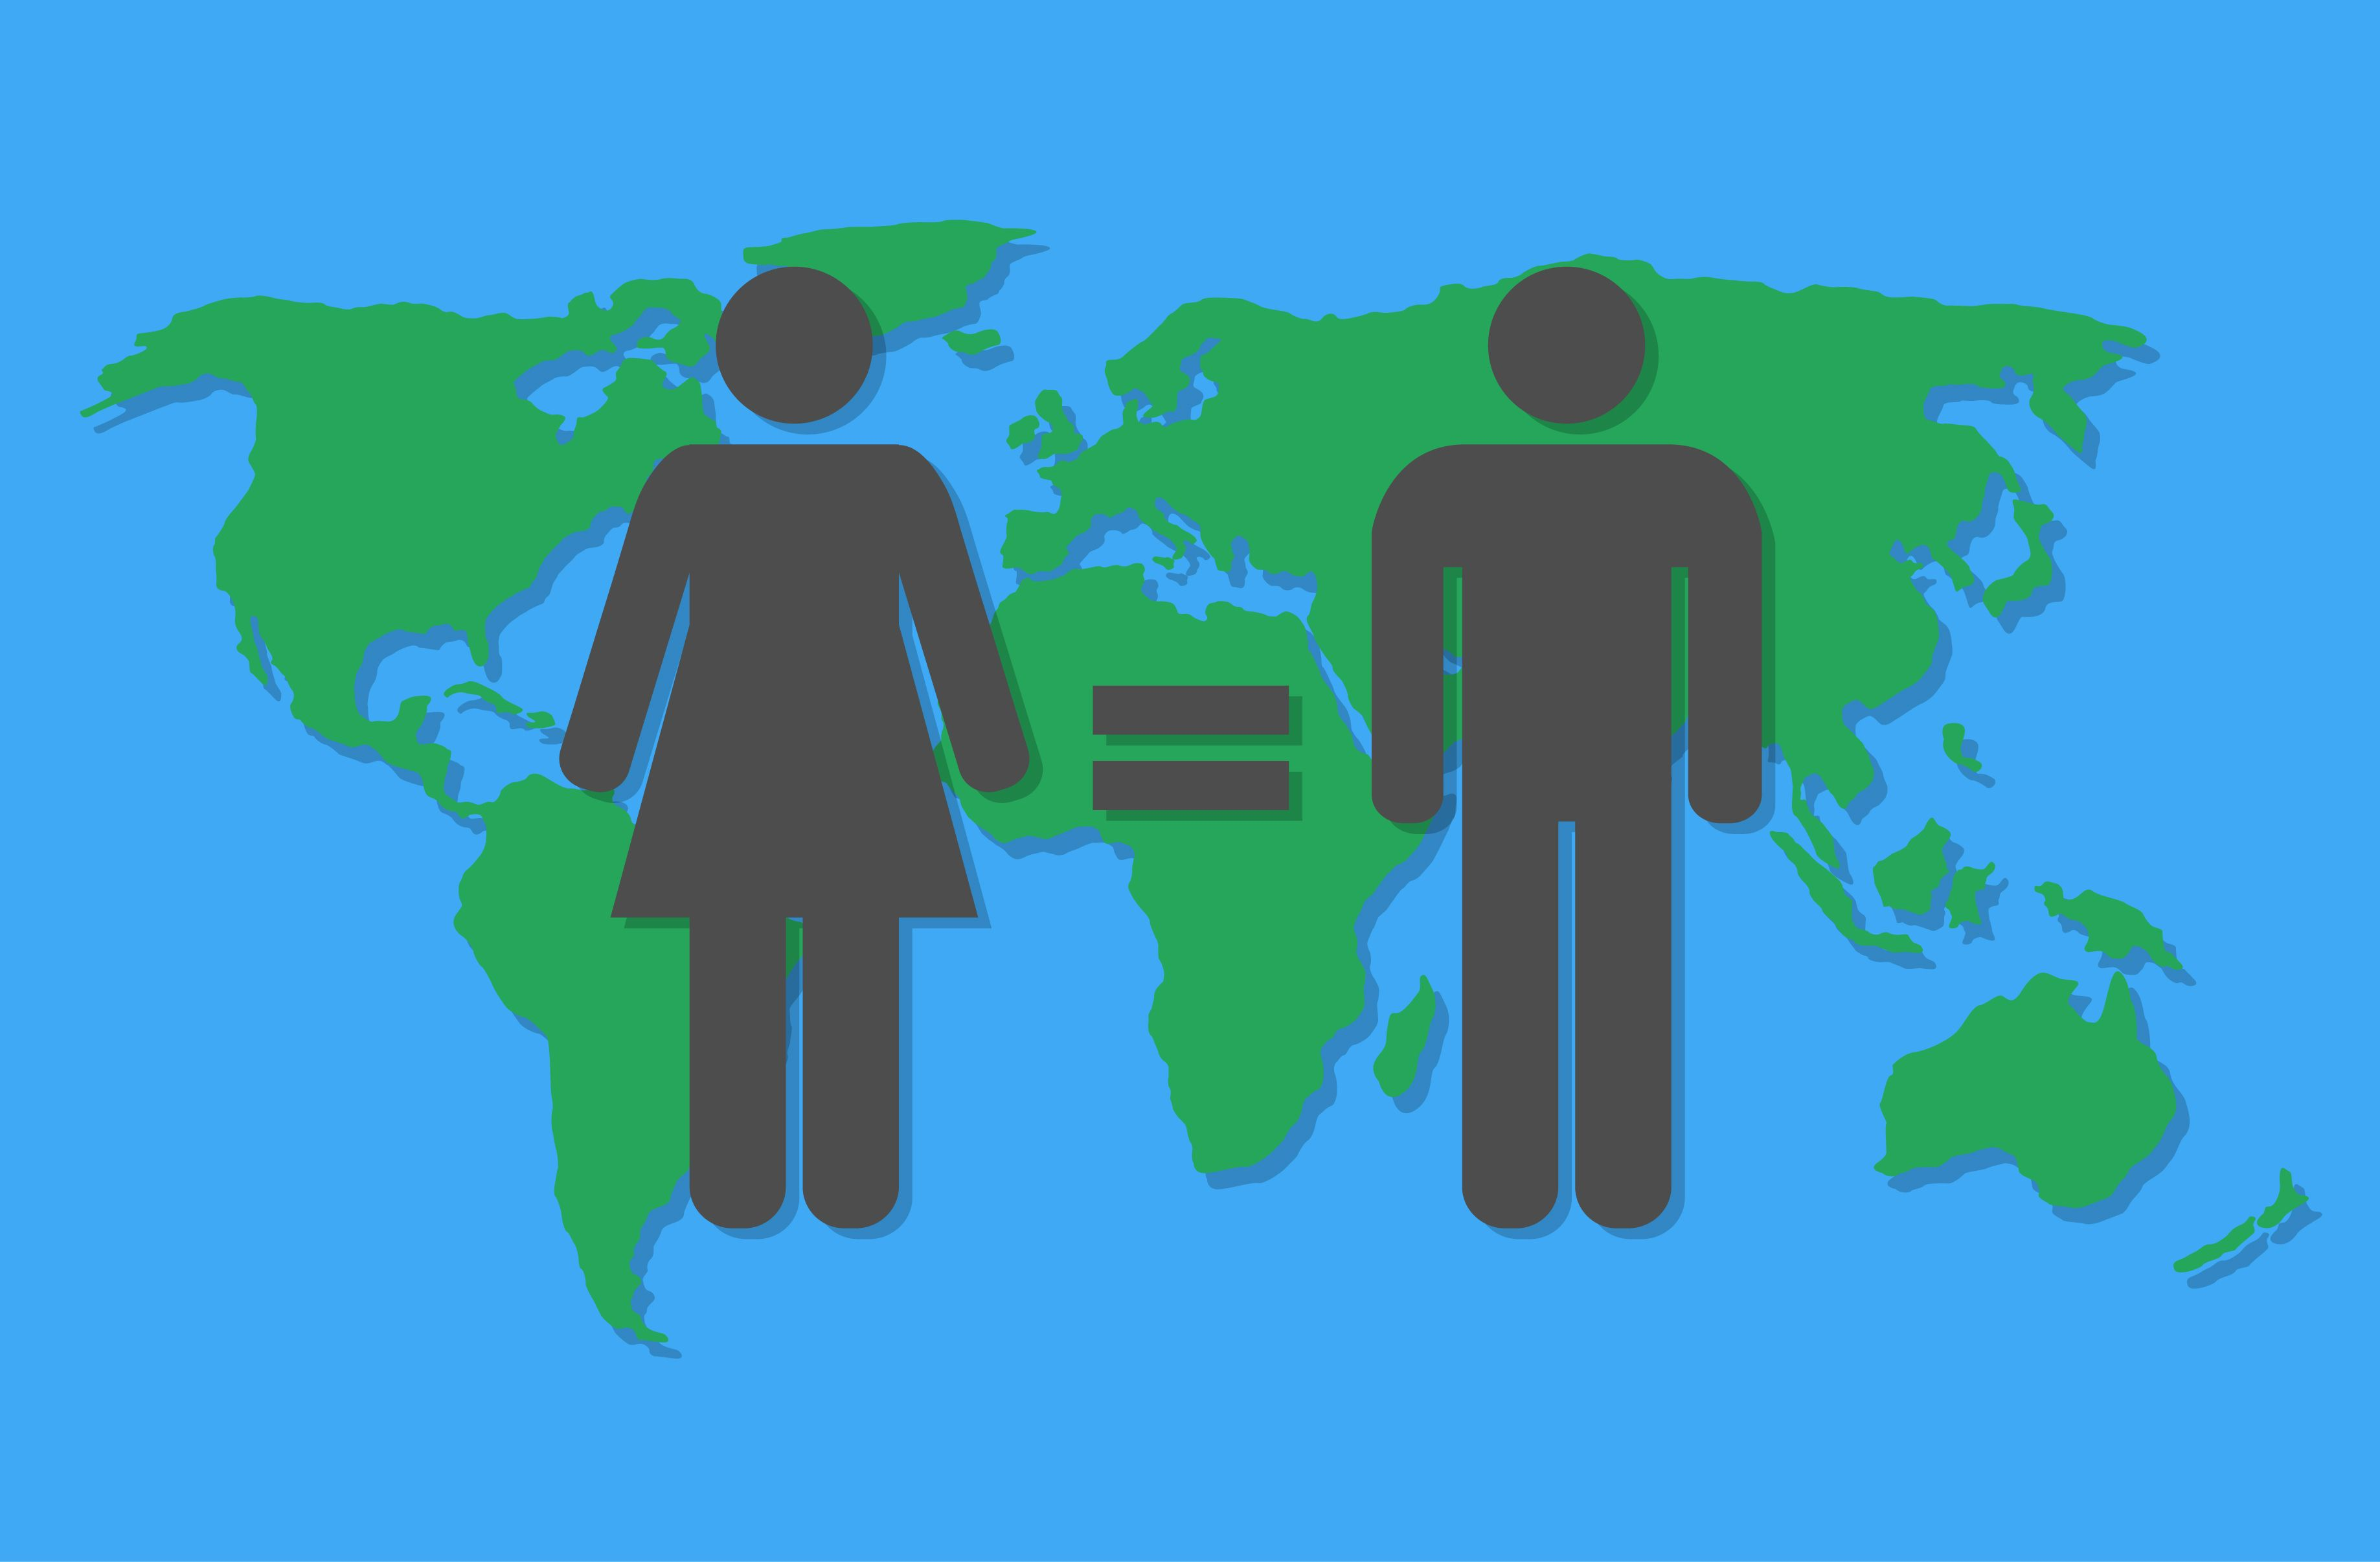 Reduced Inequalities Inequality, Sustainable development